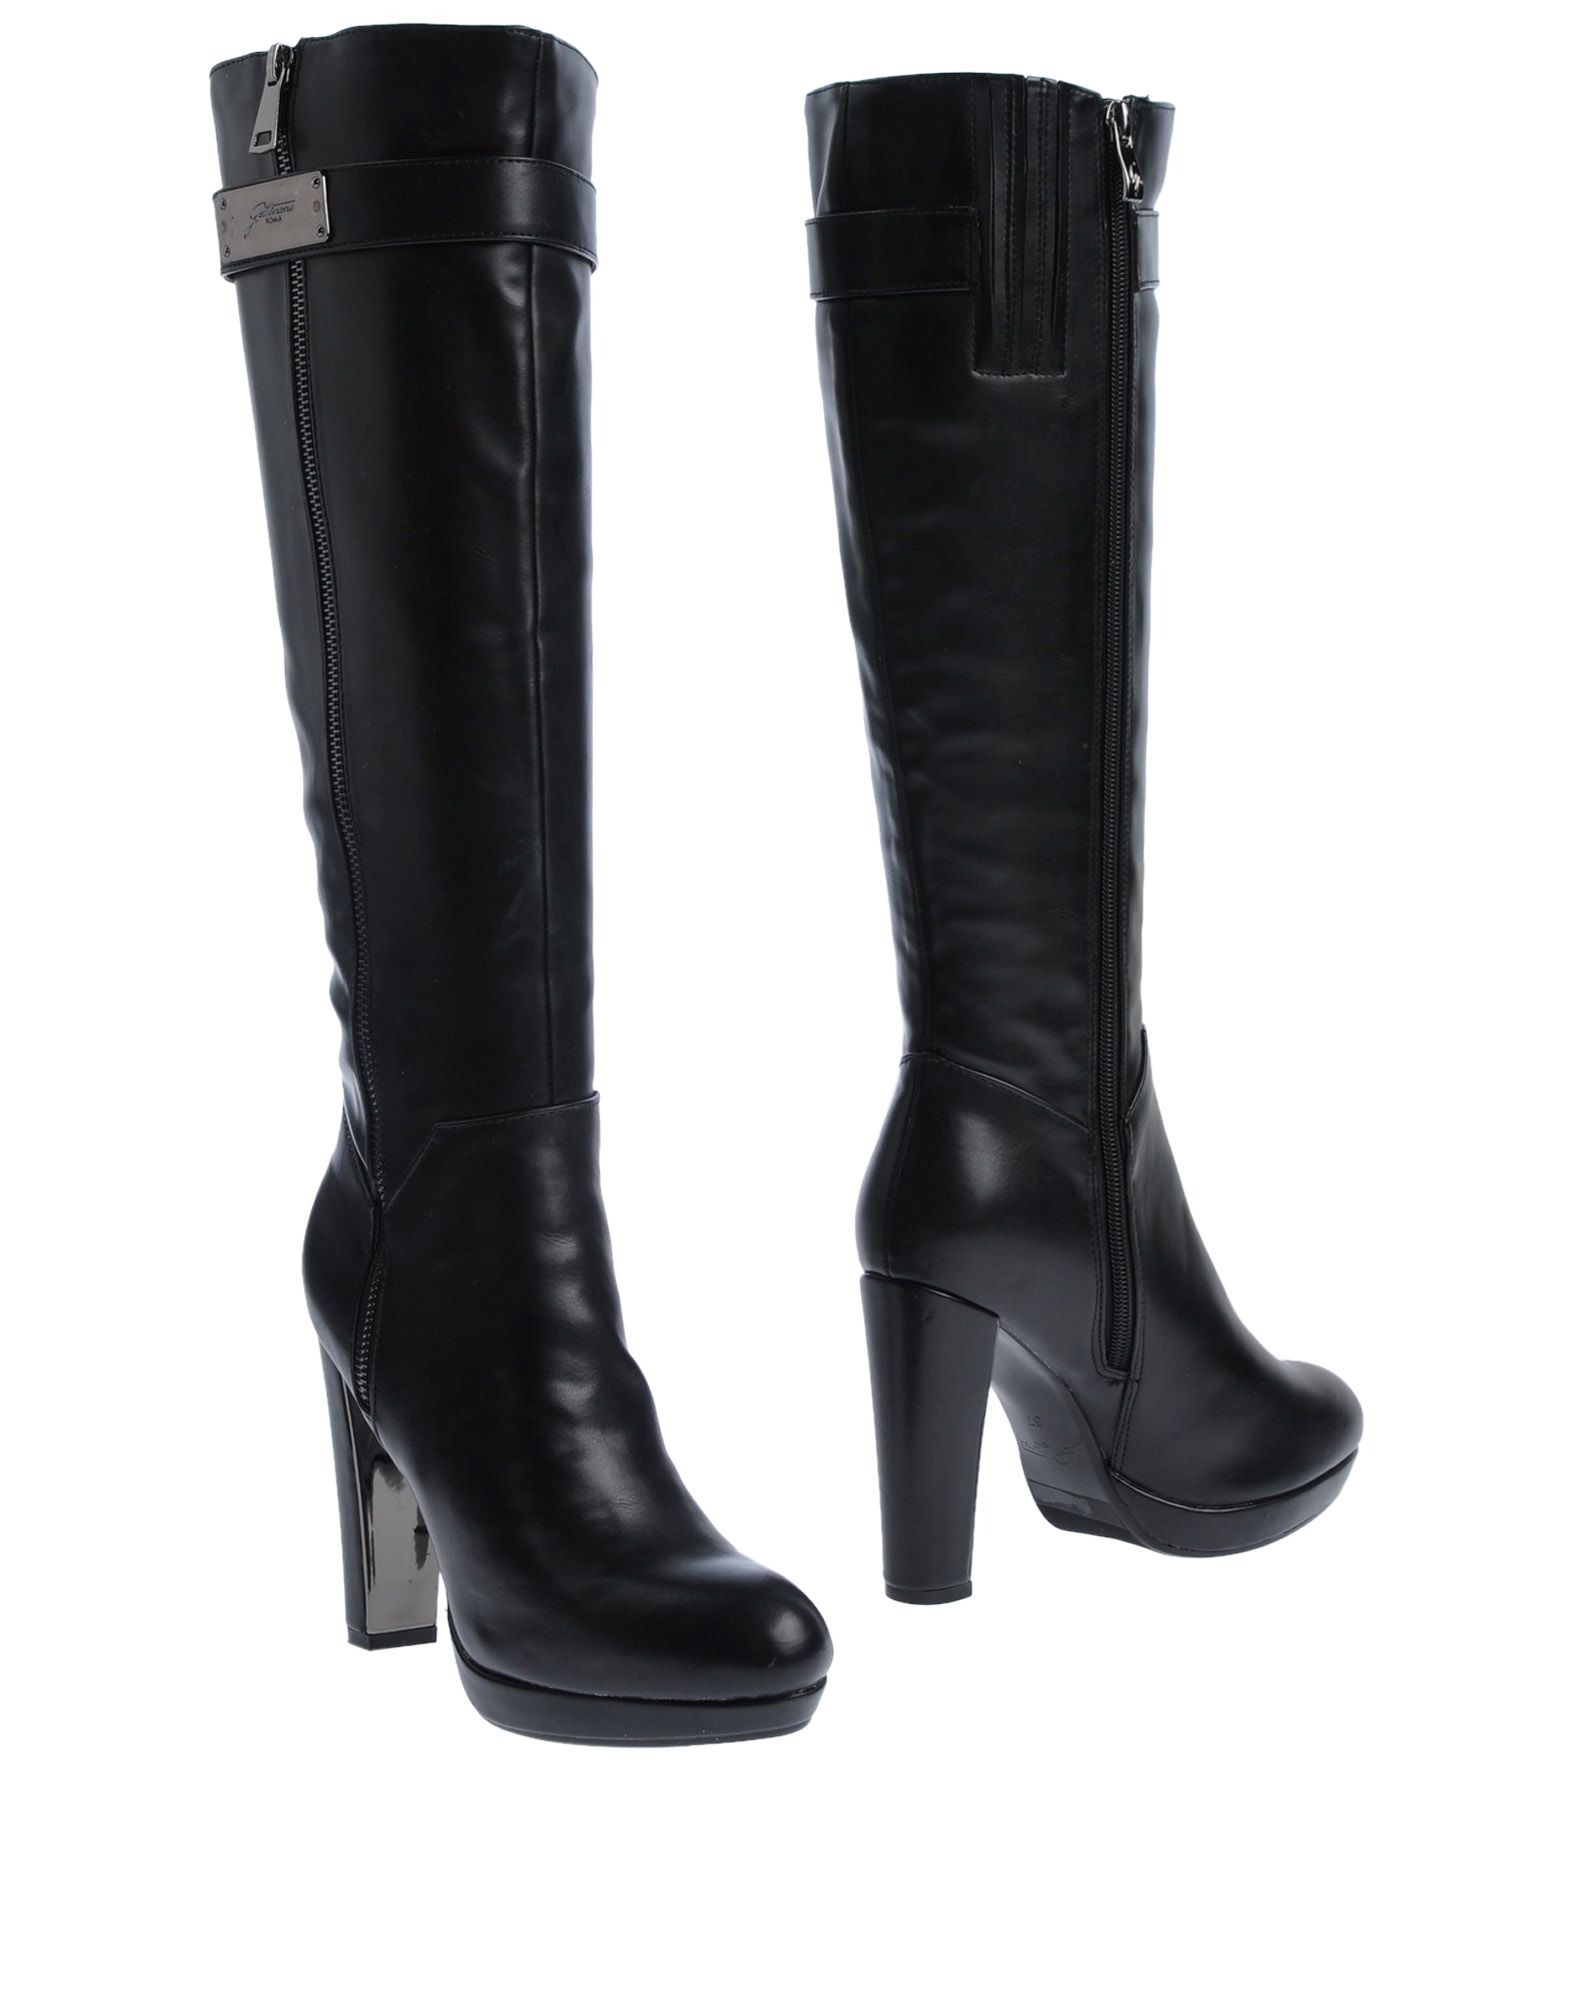 Gattinoni Stiefel strapazierfähige Damen  11507286VUGut aussehende strapazierfähige Stiefel Schuhe 0af7f7